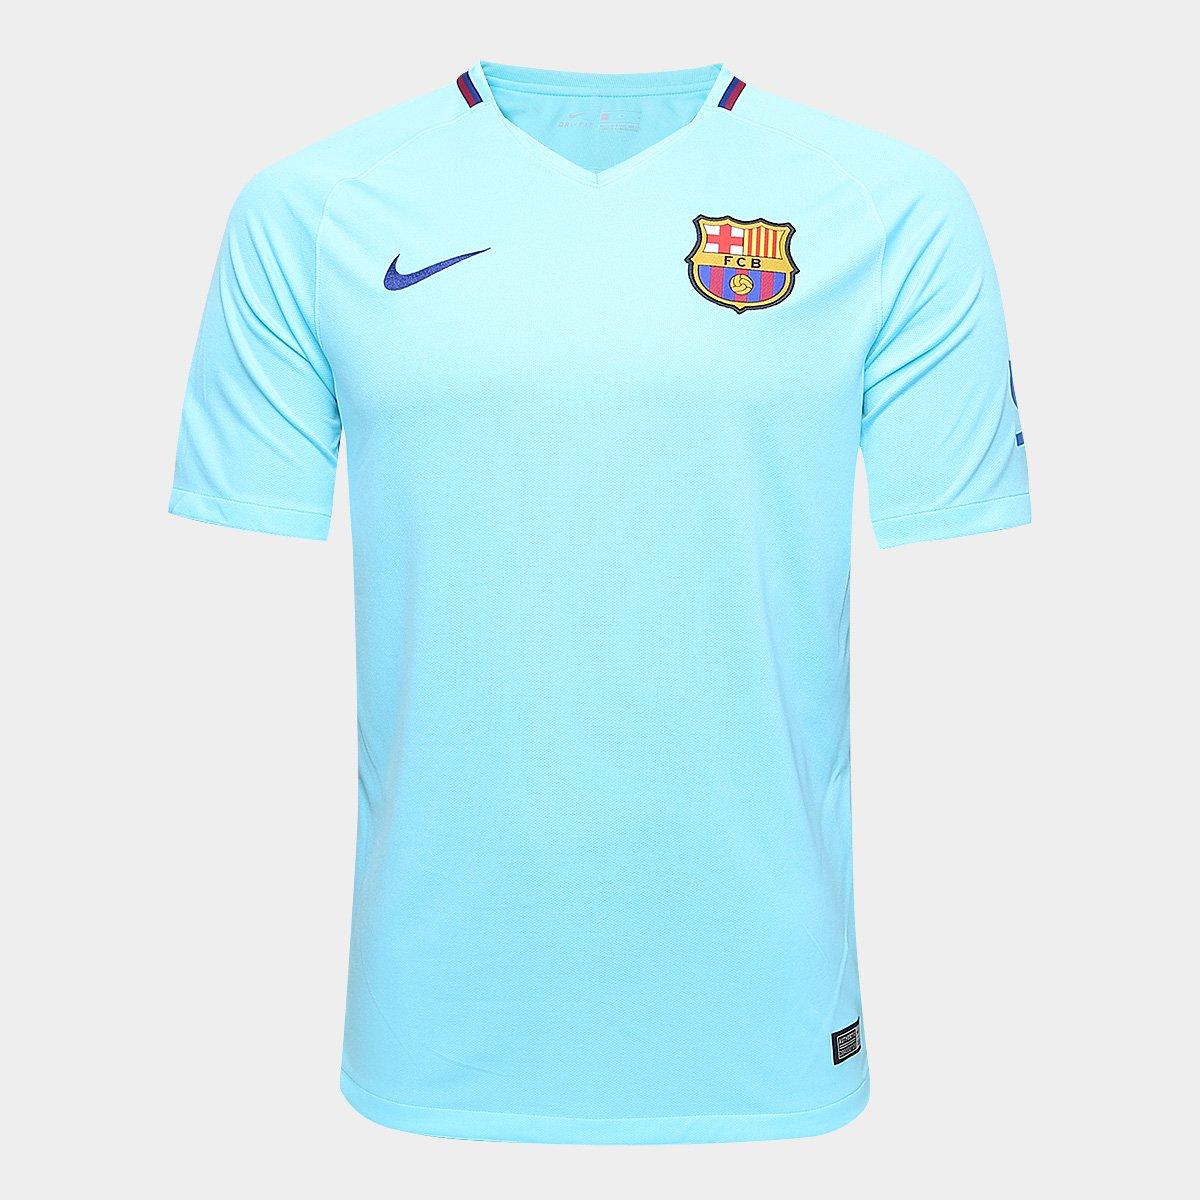 Camisa Barcelona Away 17 18 s n° Torcedor Nike Masculina 58dbbab6a7fde